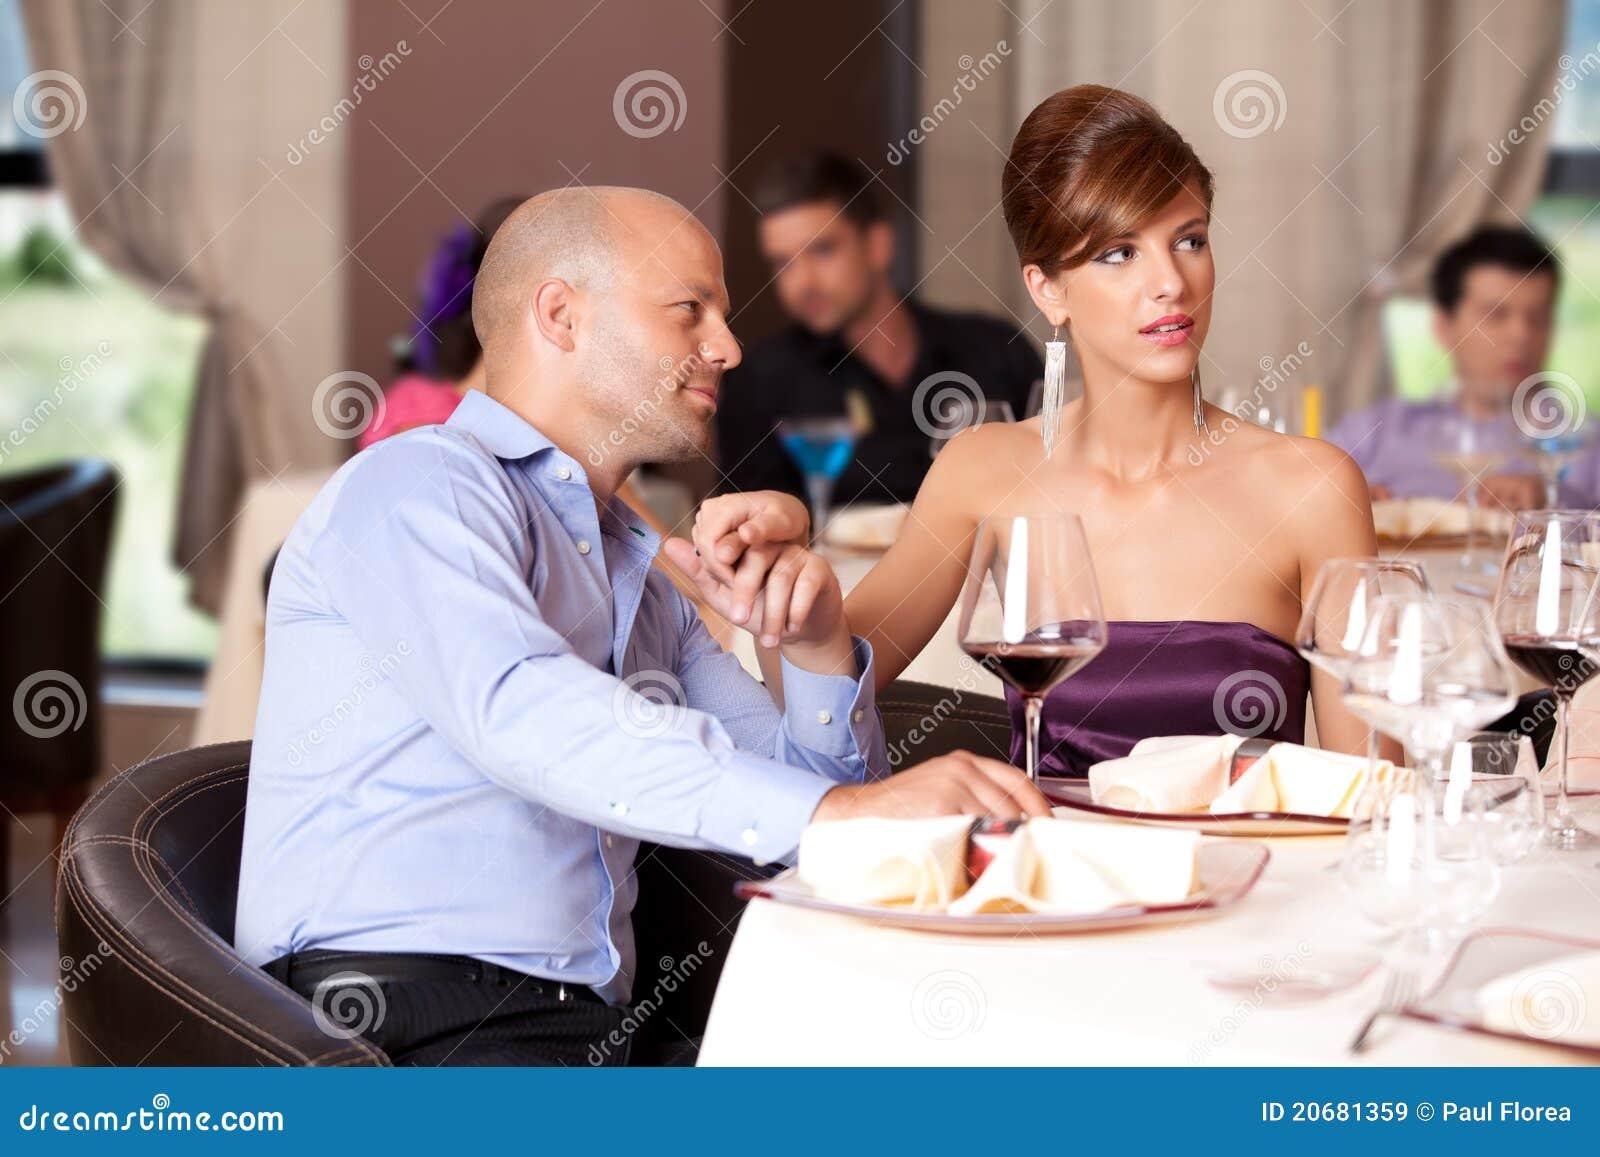 flirting signs of married women free men dating women